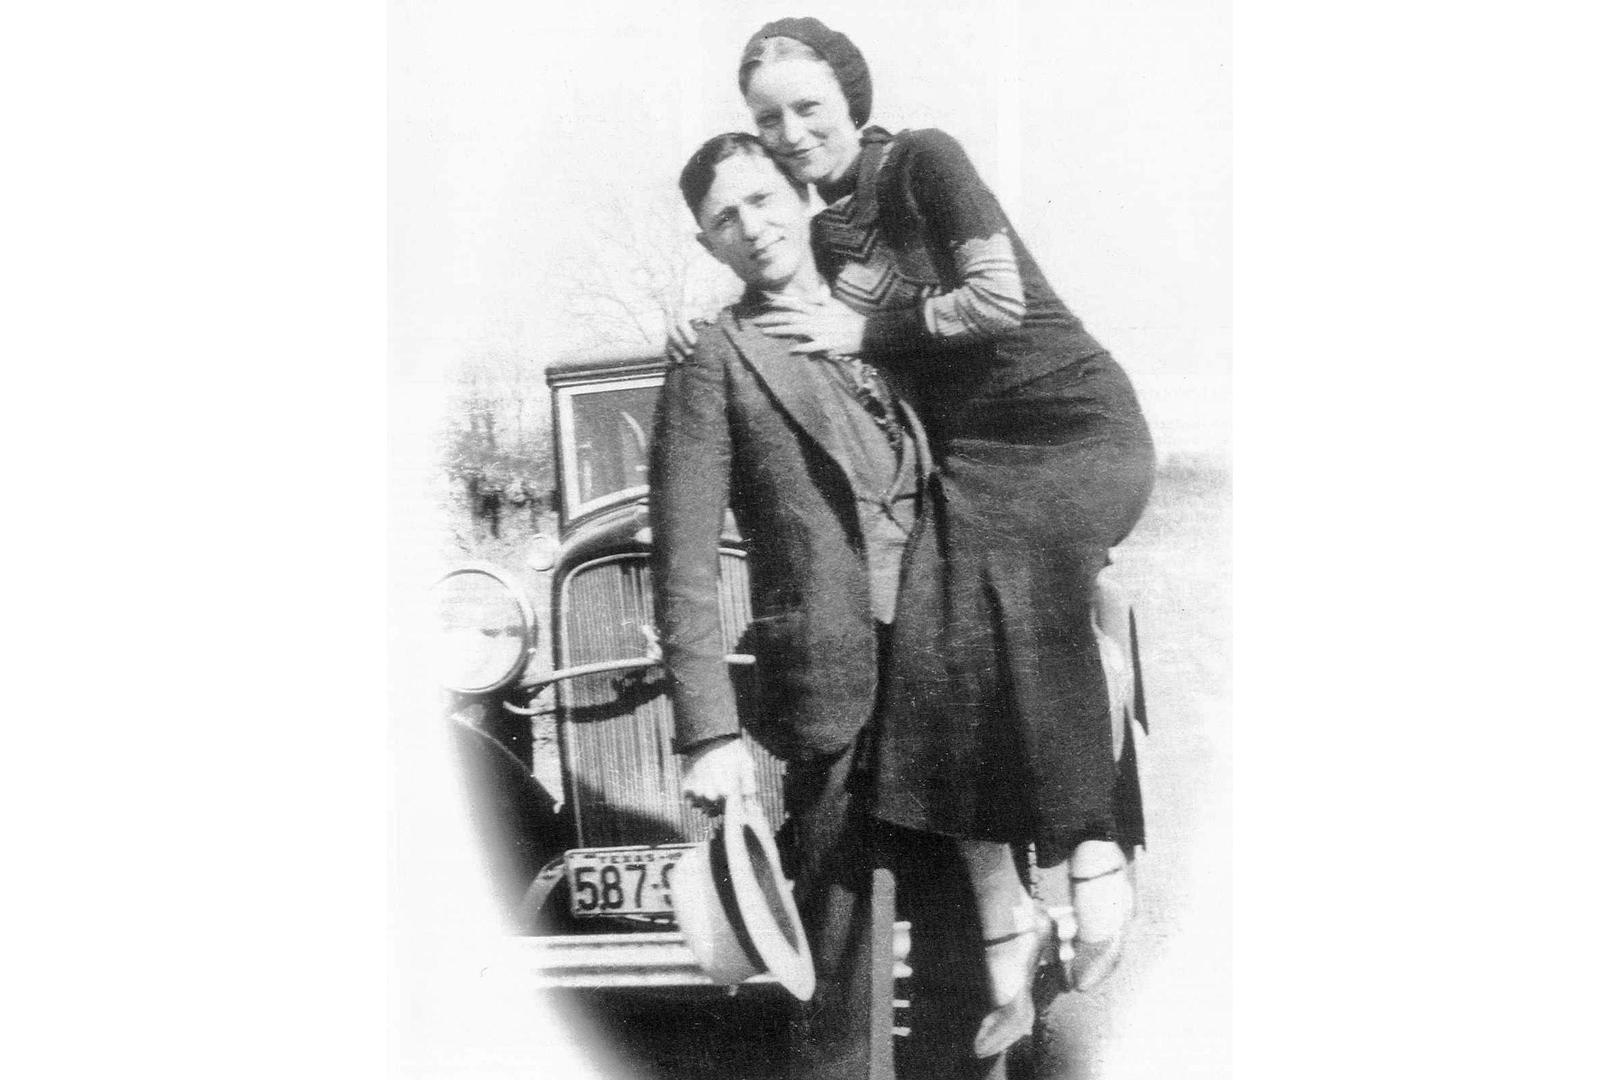 1933  prohibition ends  bonnie and clyde visit iowa